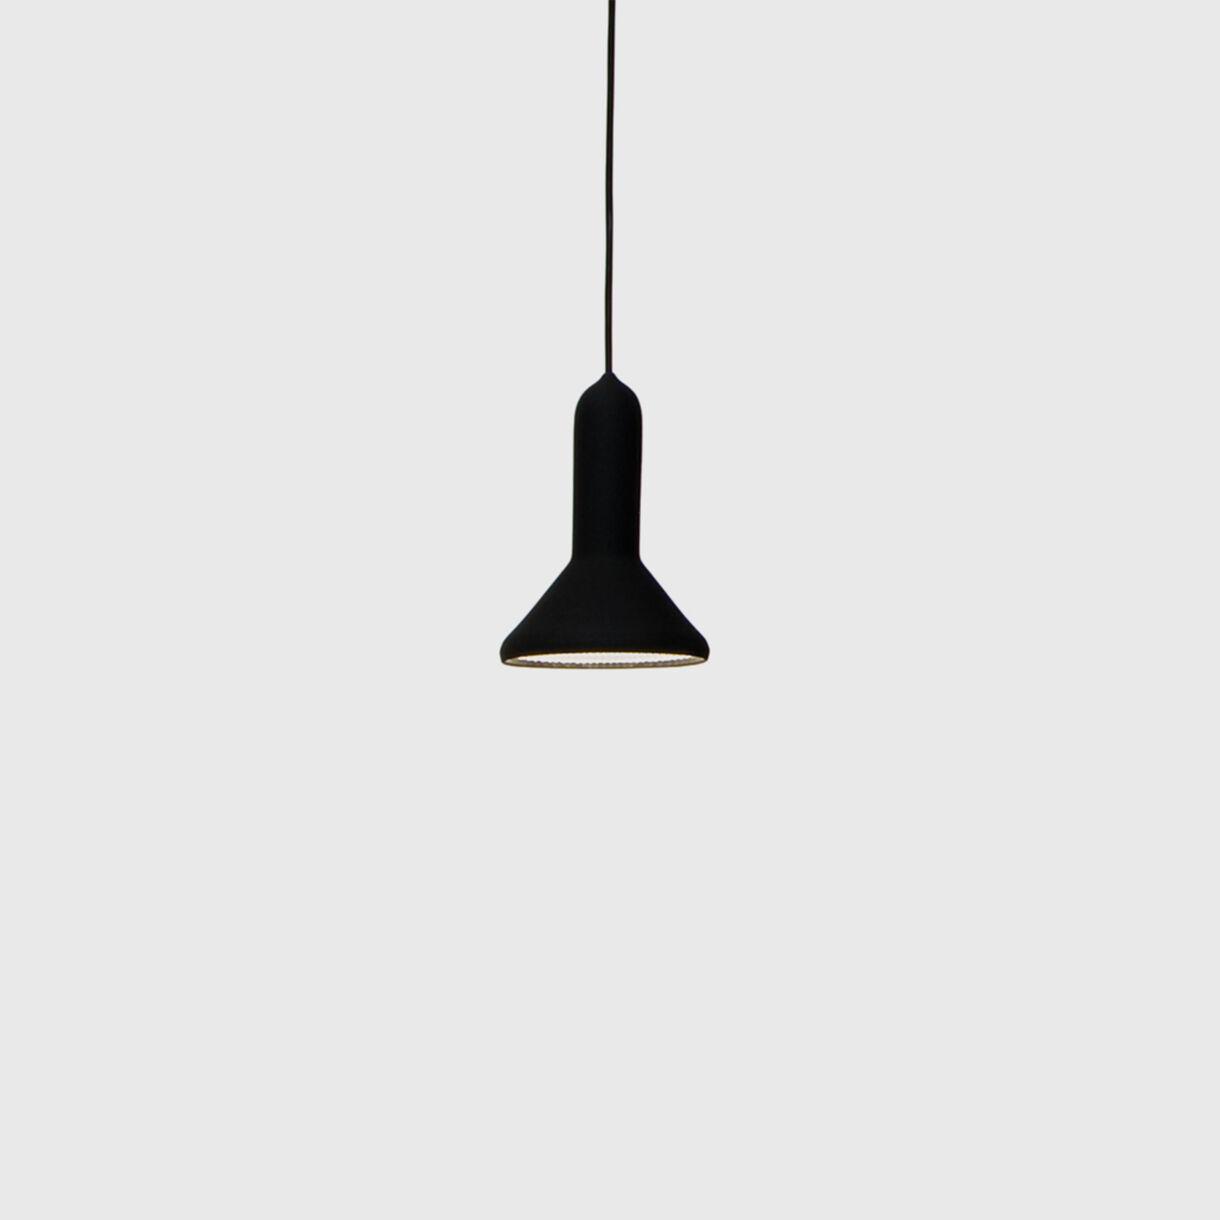 Torch Light, S1 Cone, Black